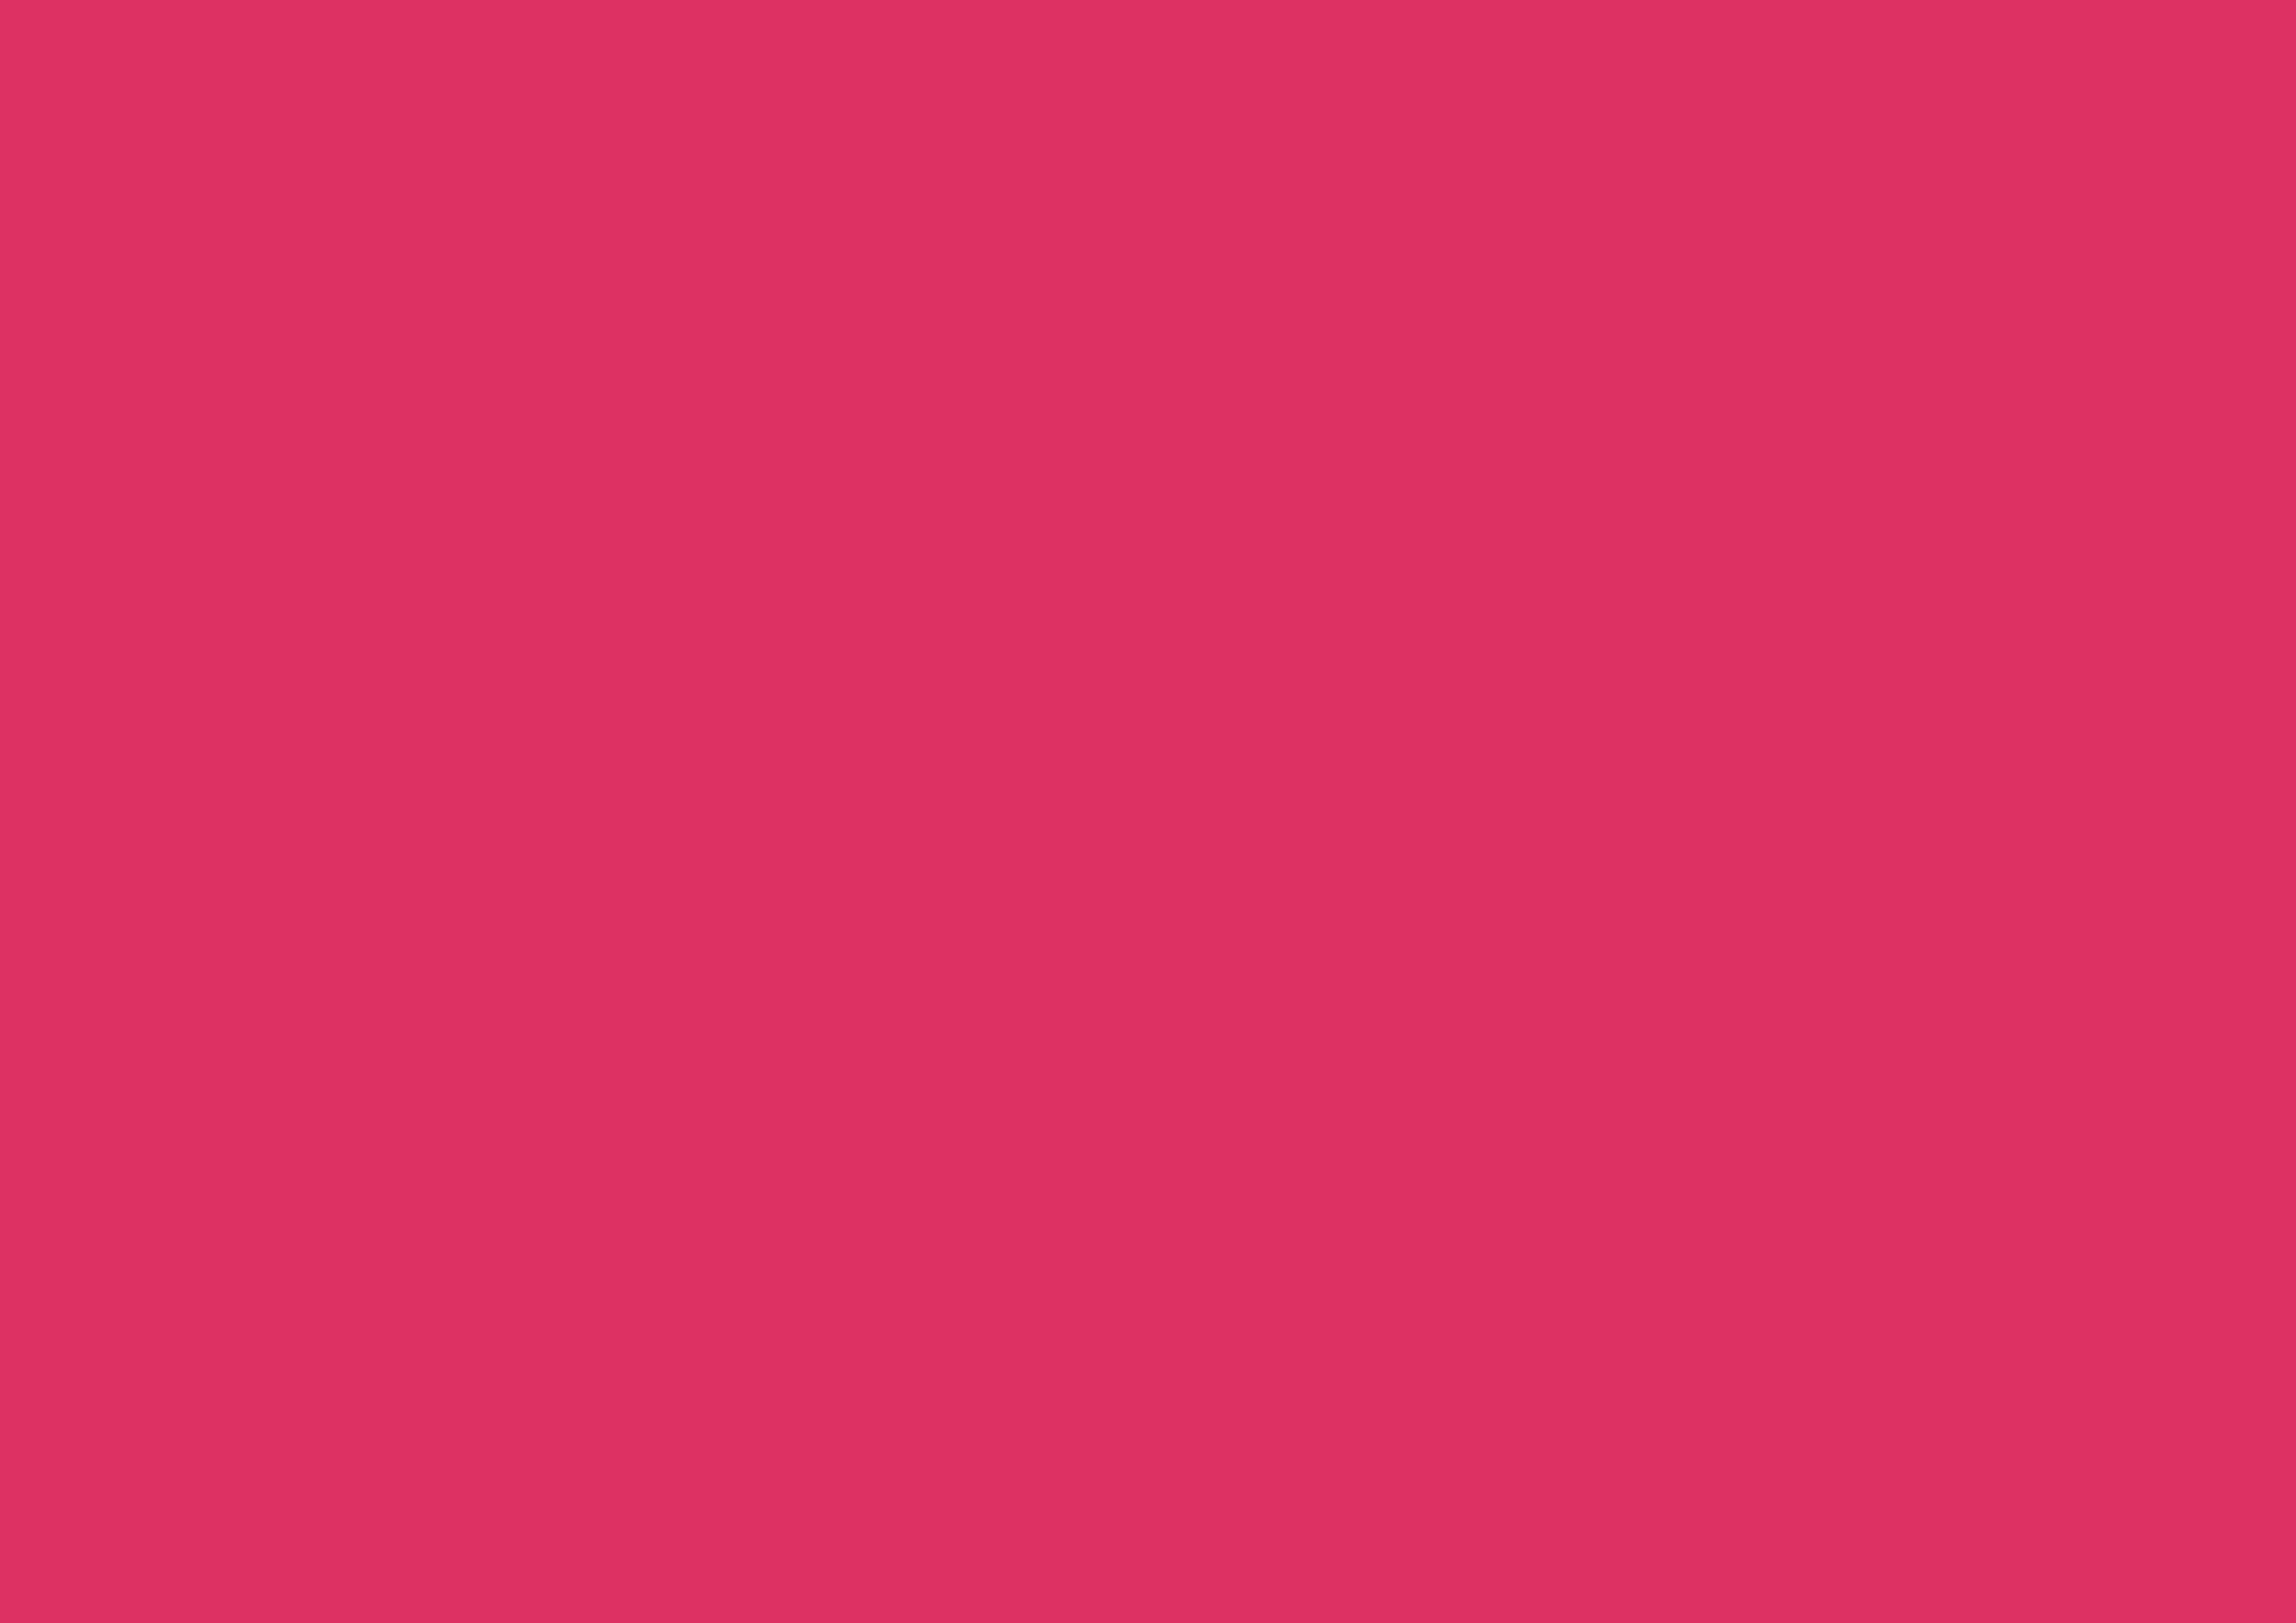 3508x2480 Cerise Solid Color Background